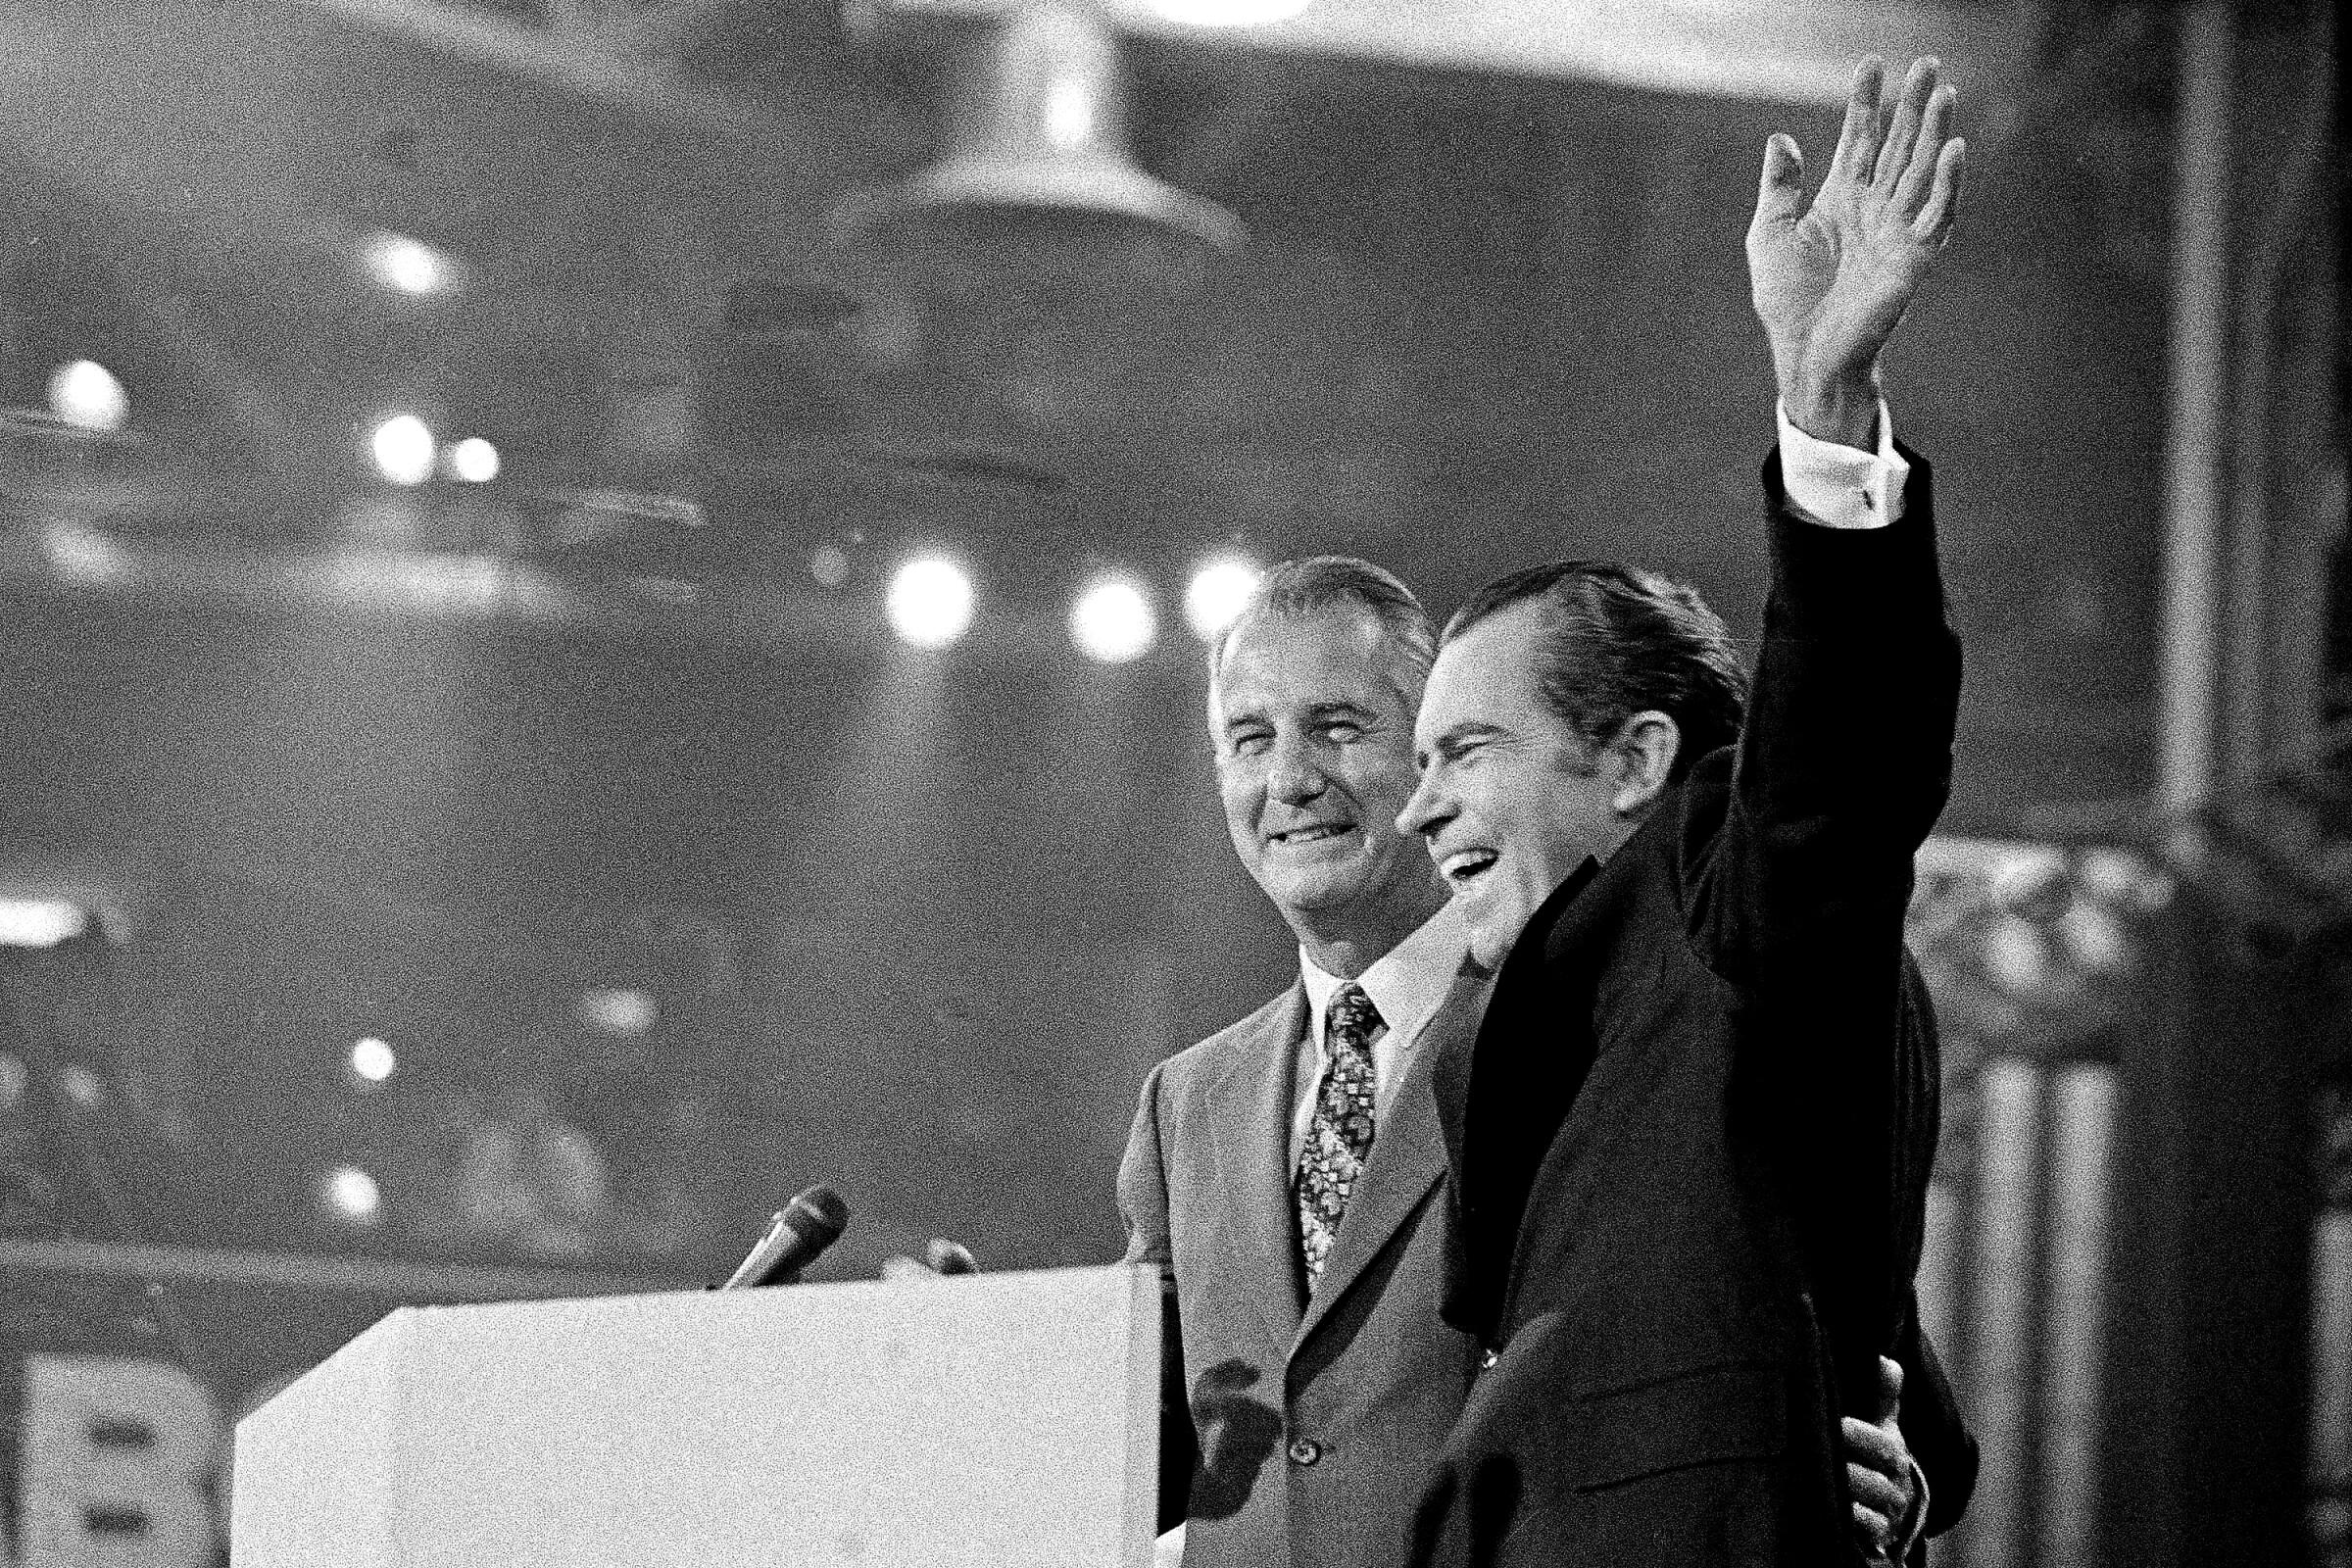 Richard Nixon, right, with running mate Spiro Agnew in 1972.